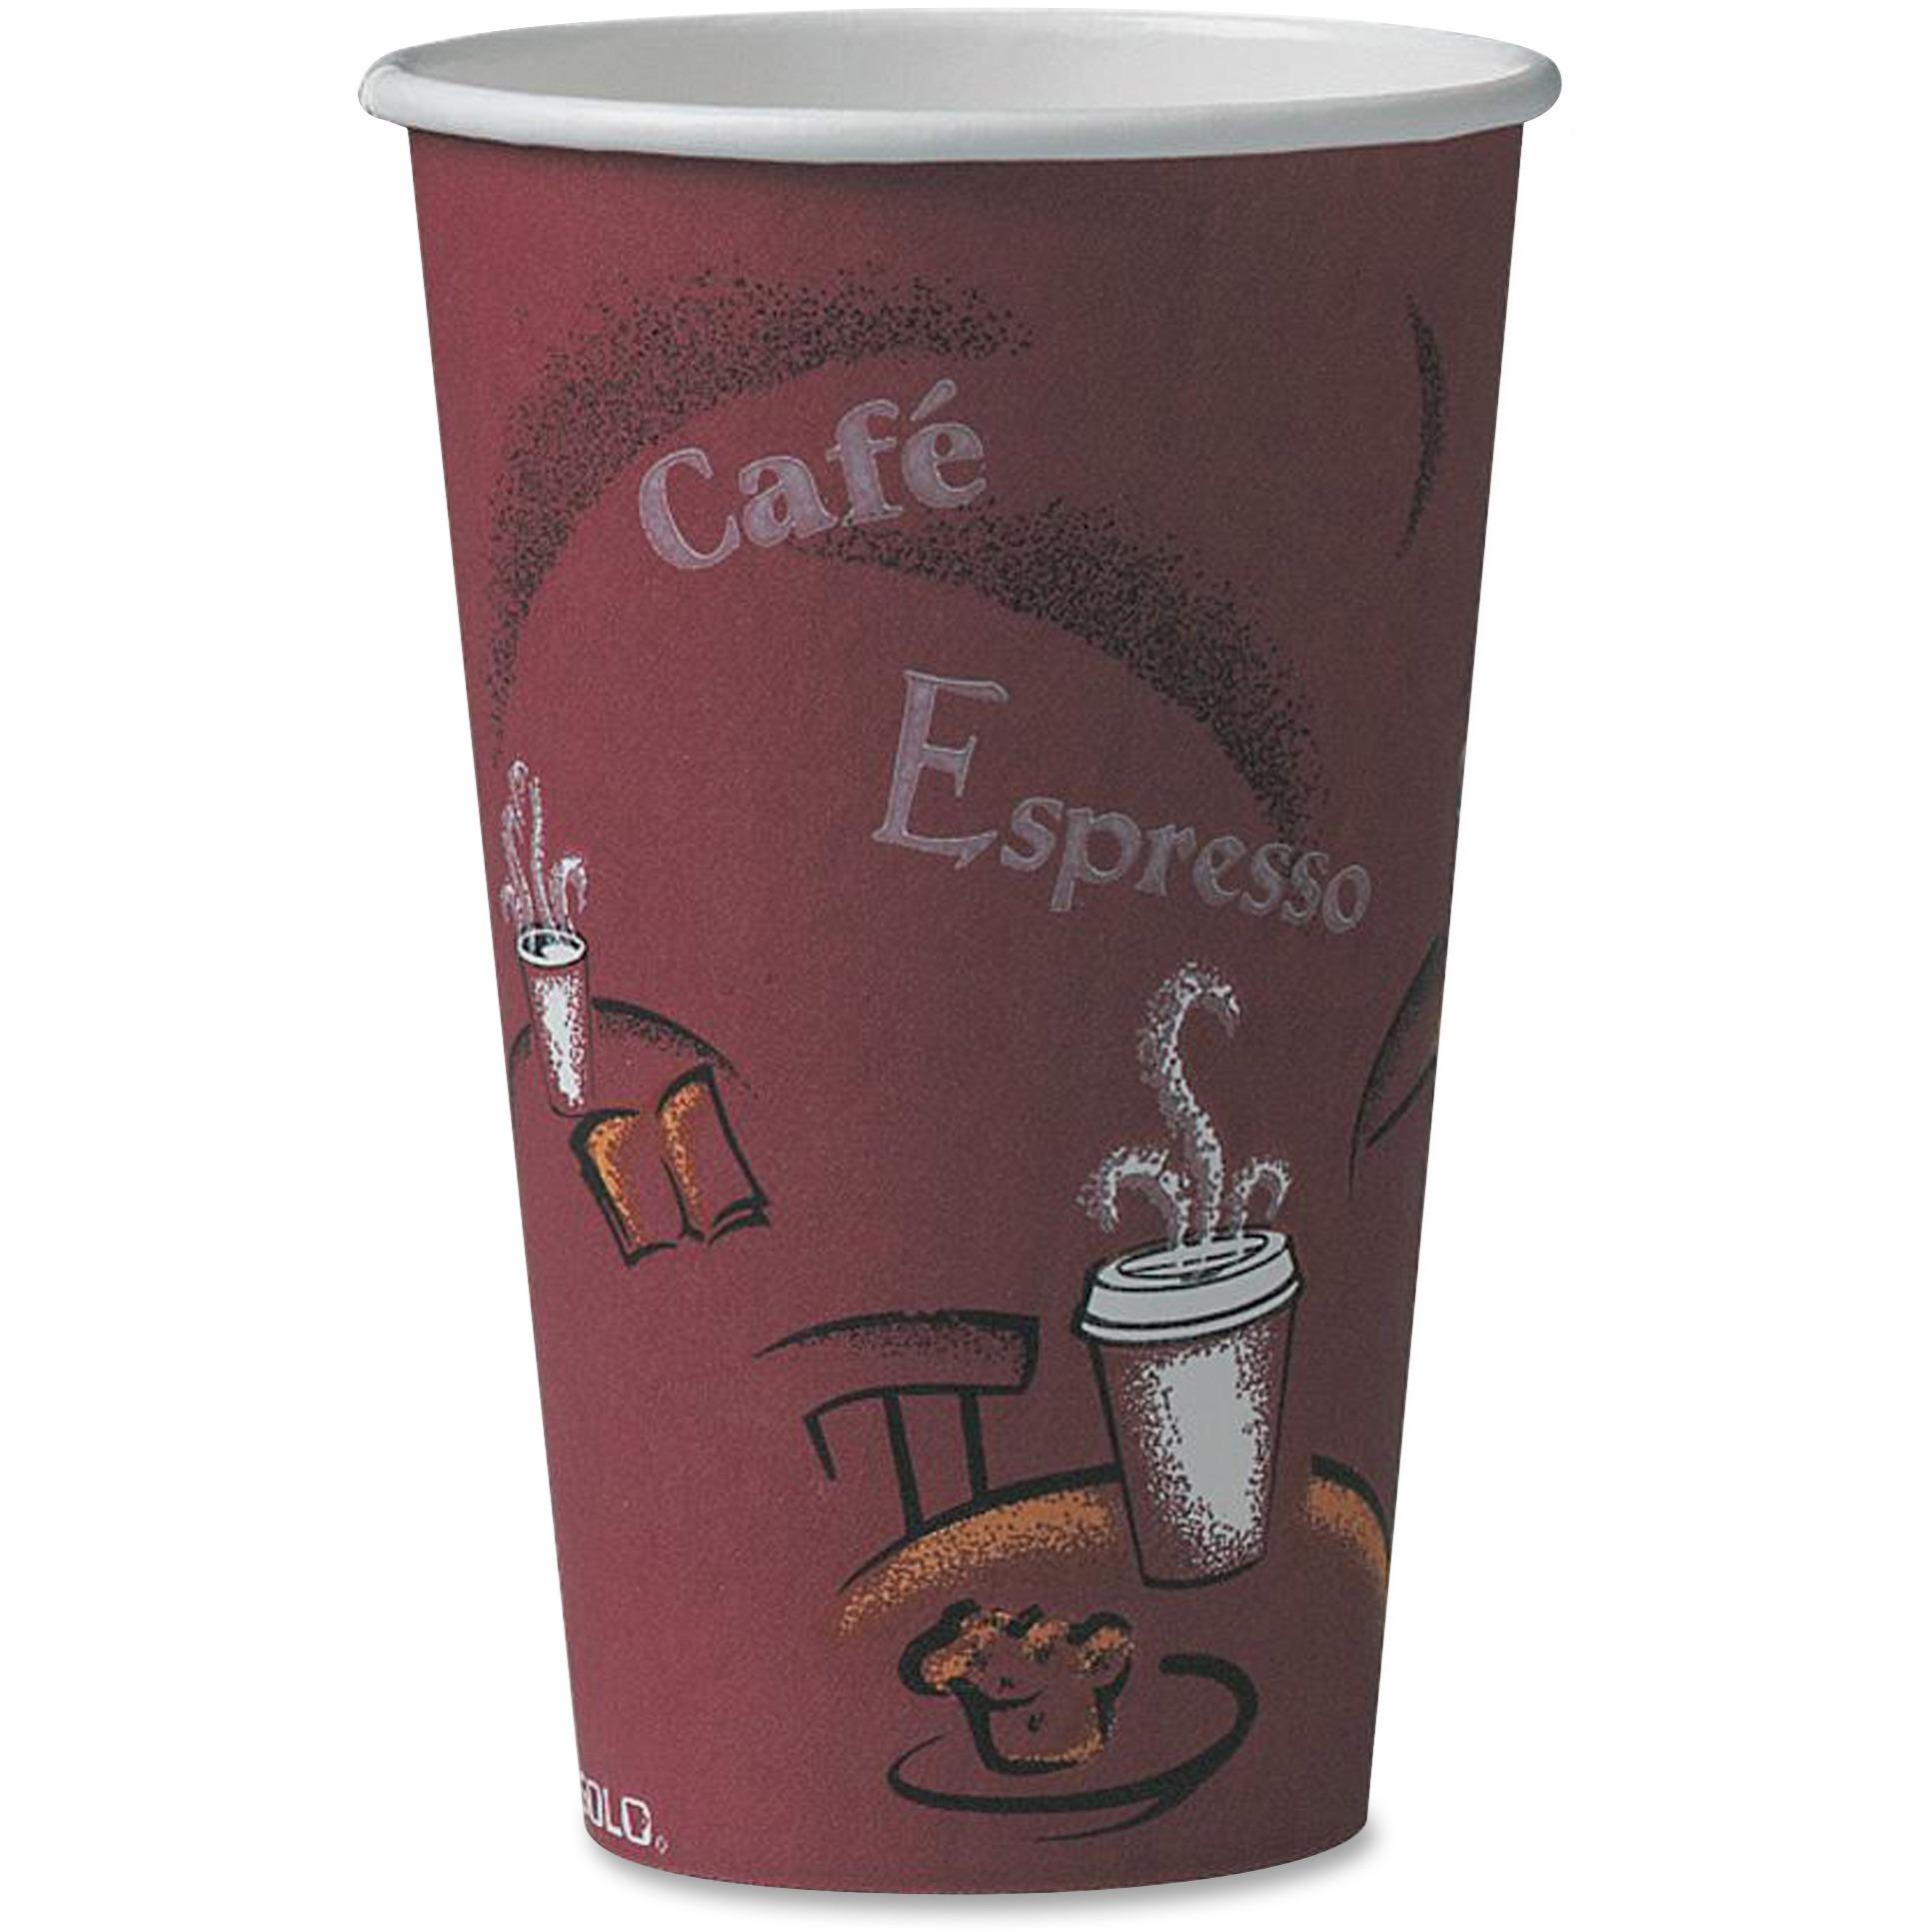 Solo, SCC316SI0041, Bistro Design Disposable Paper Cups, 50 / Pack, Maroon, 16 fl oz